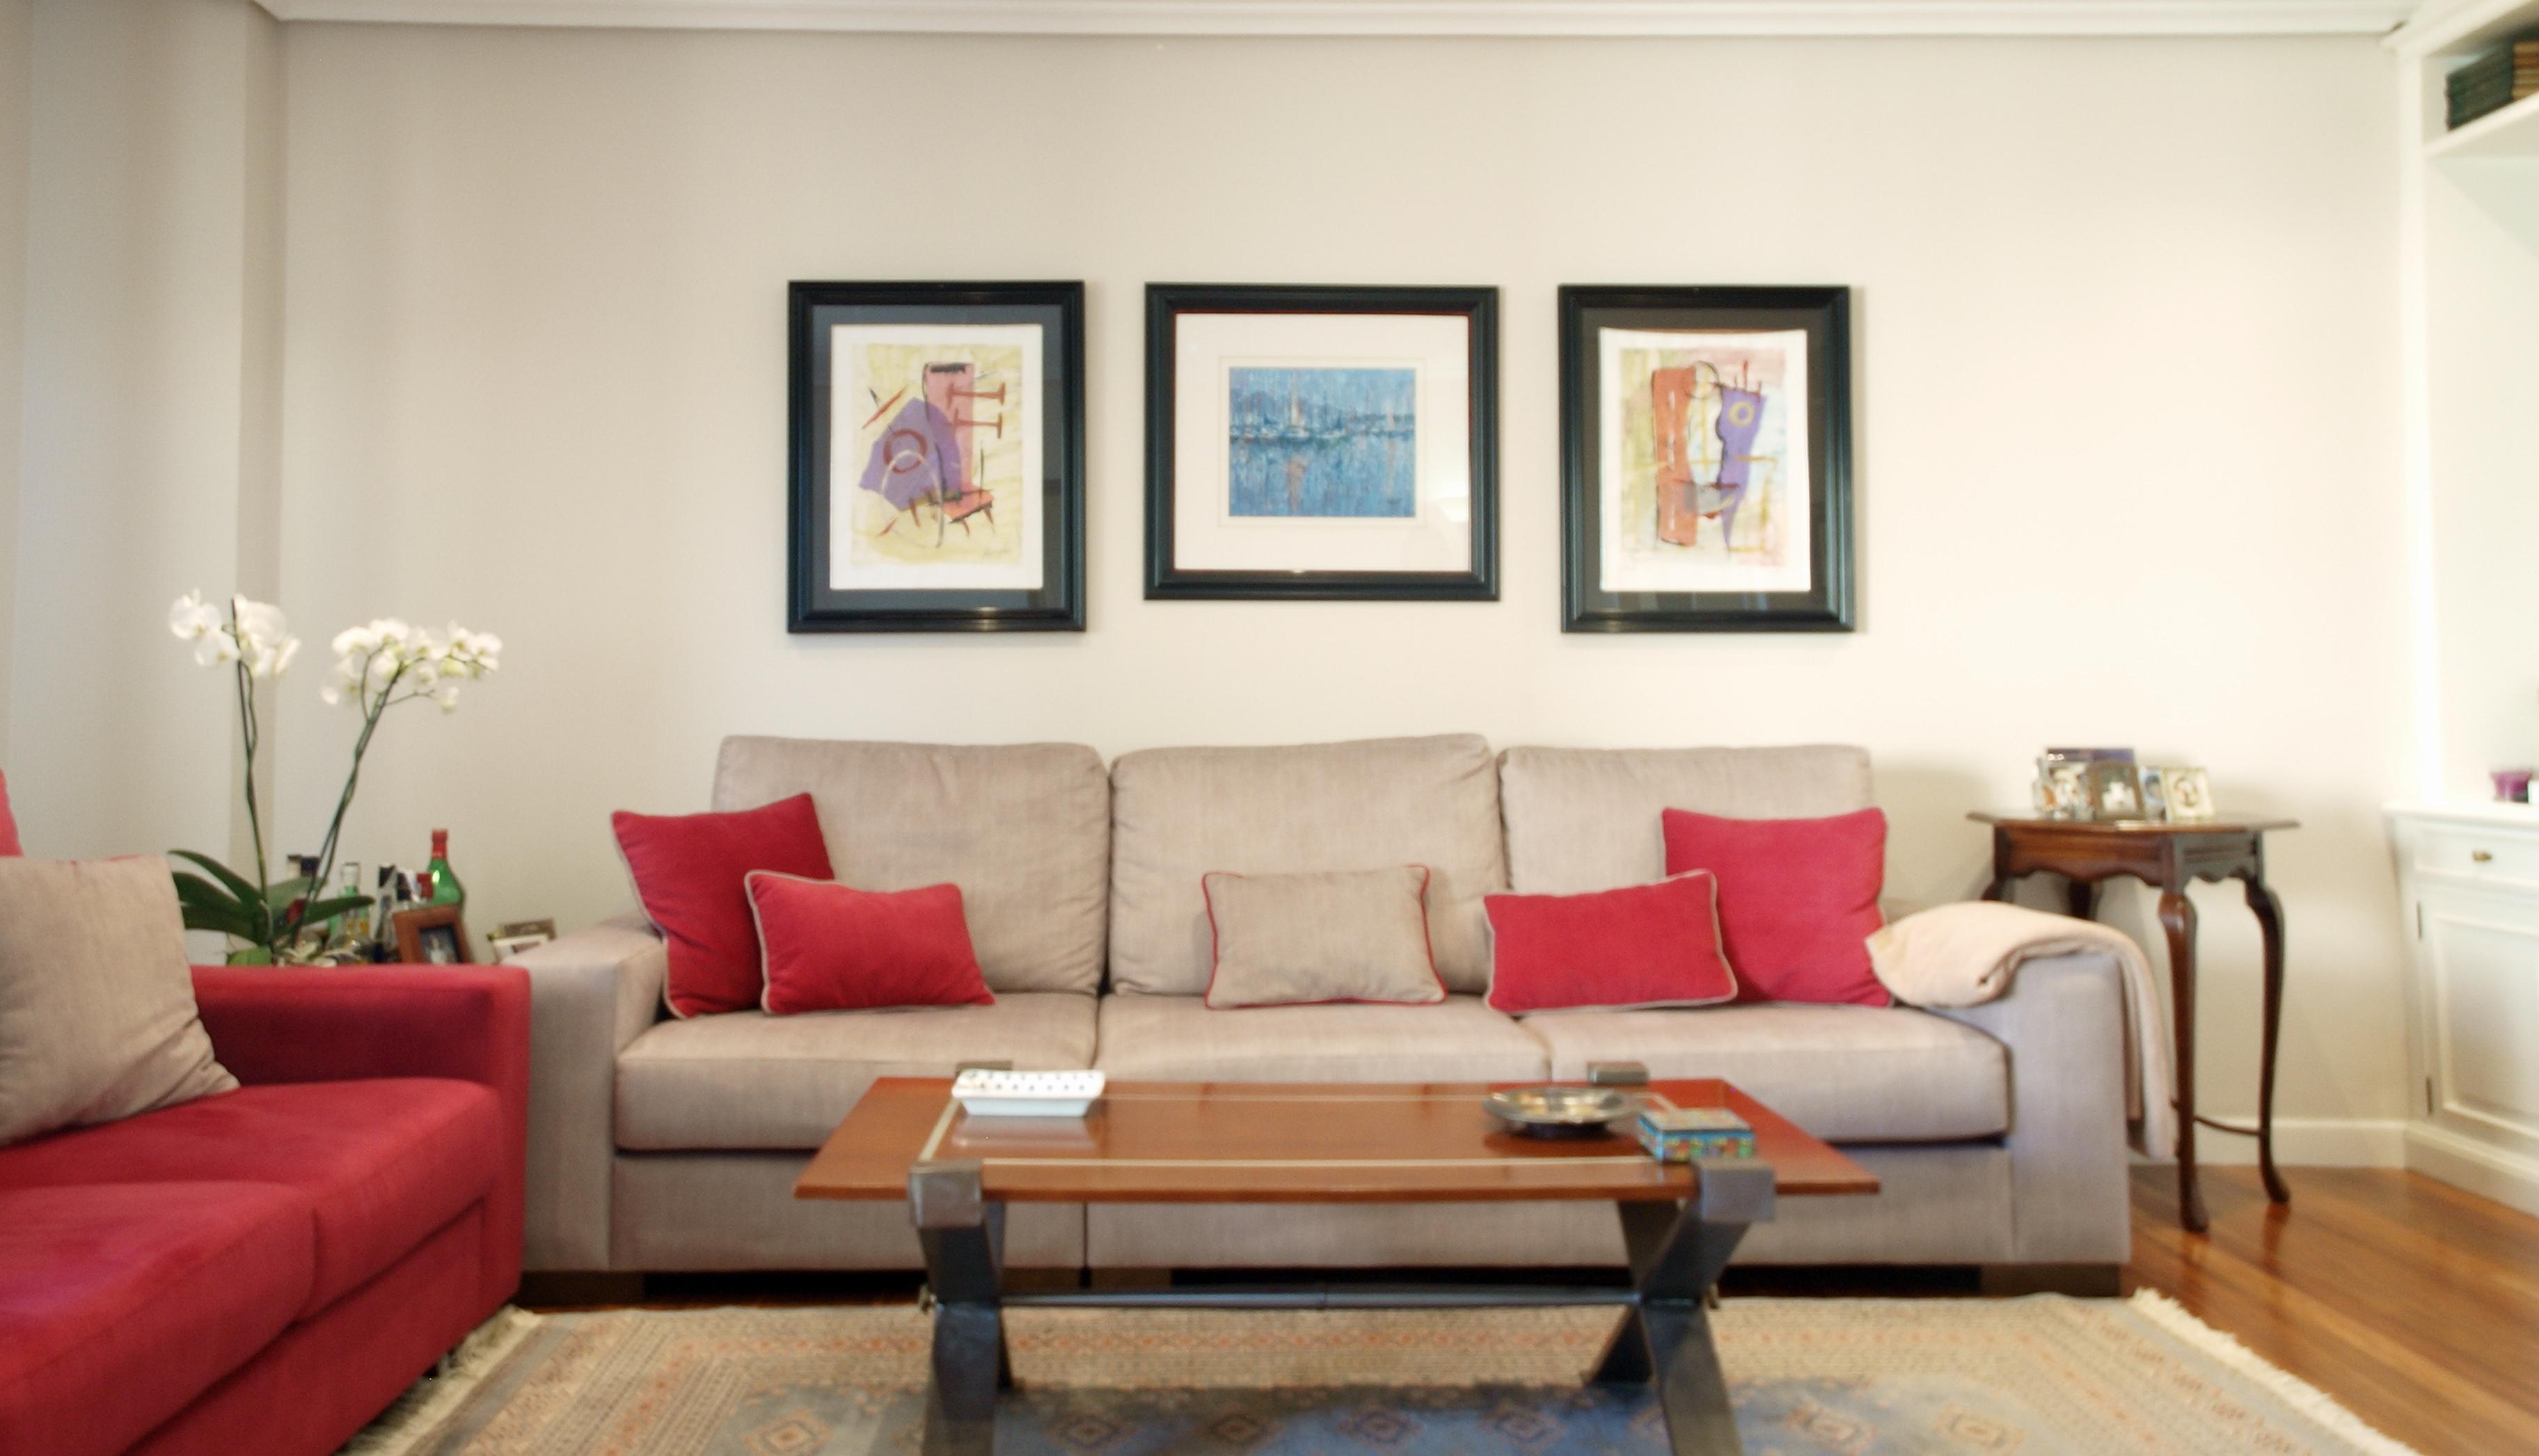 P3017900 Select Home Rentalsselect Home Rentals